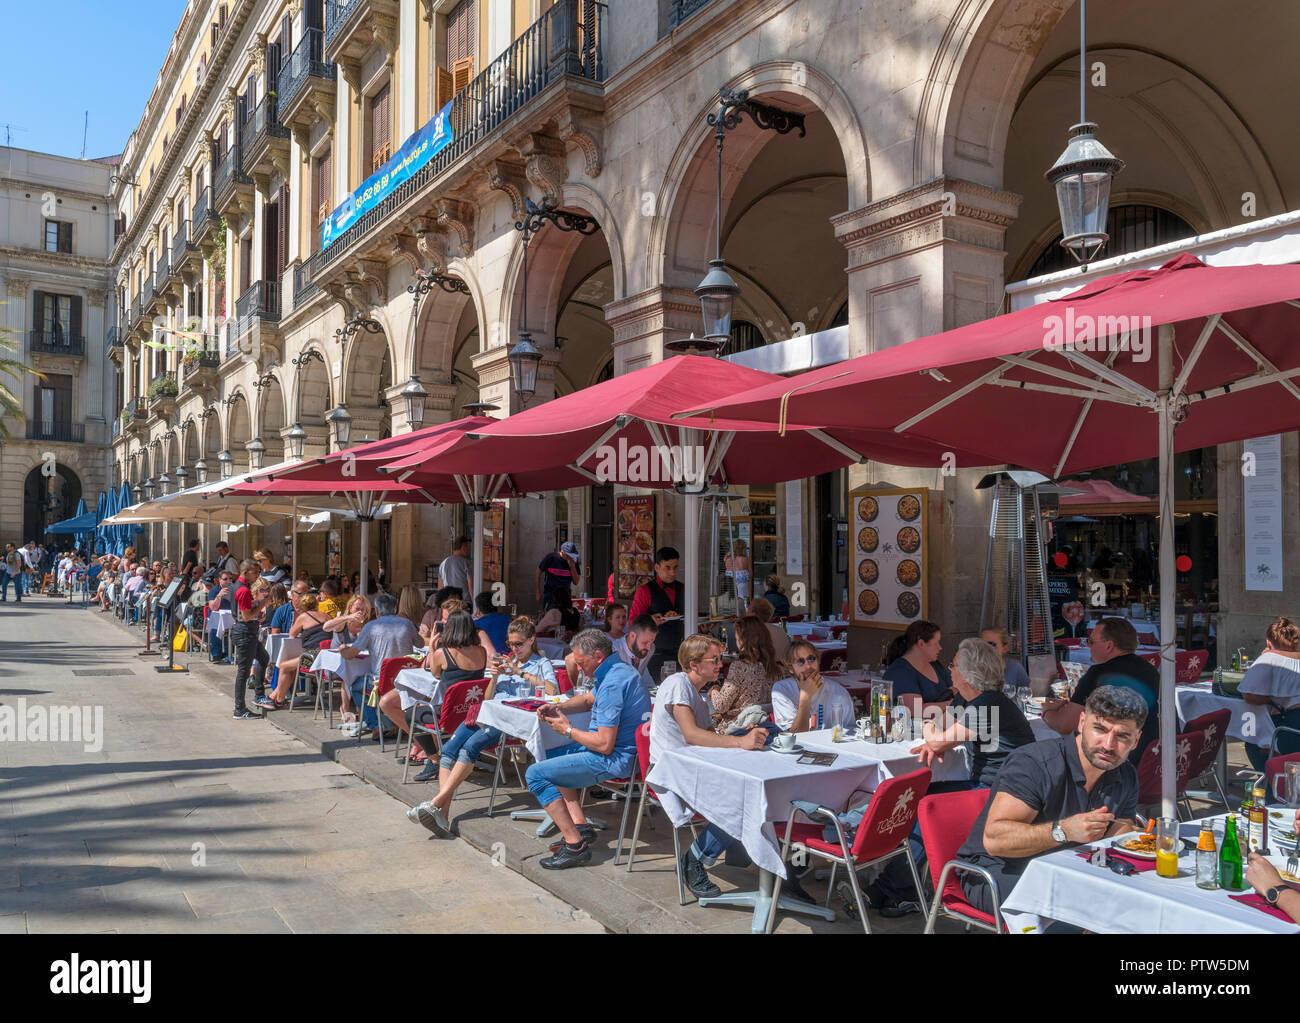 Plaça Reial, Barcelona. Tourists sitting outside a restaurant on the Plaça Reial (Plaza Real), Barri Gotic, Barcelona, Catalunya, Spain. - Stock Image